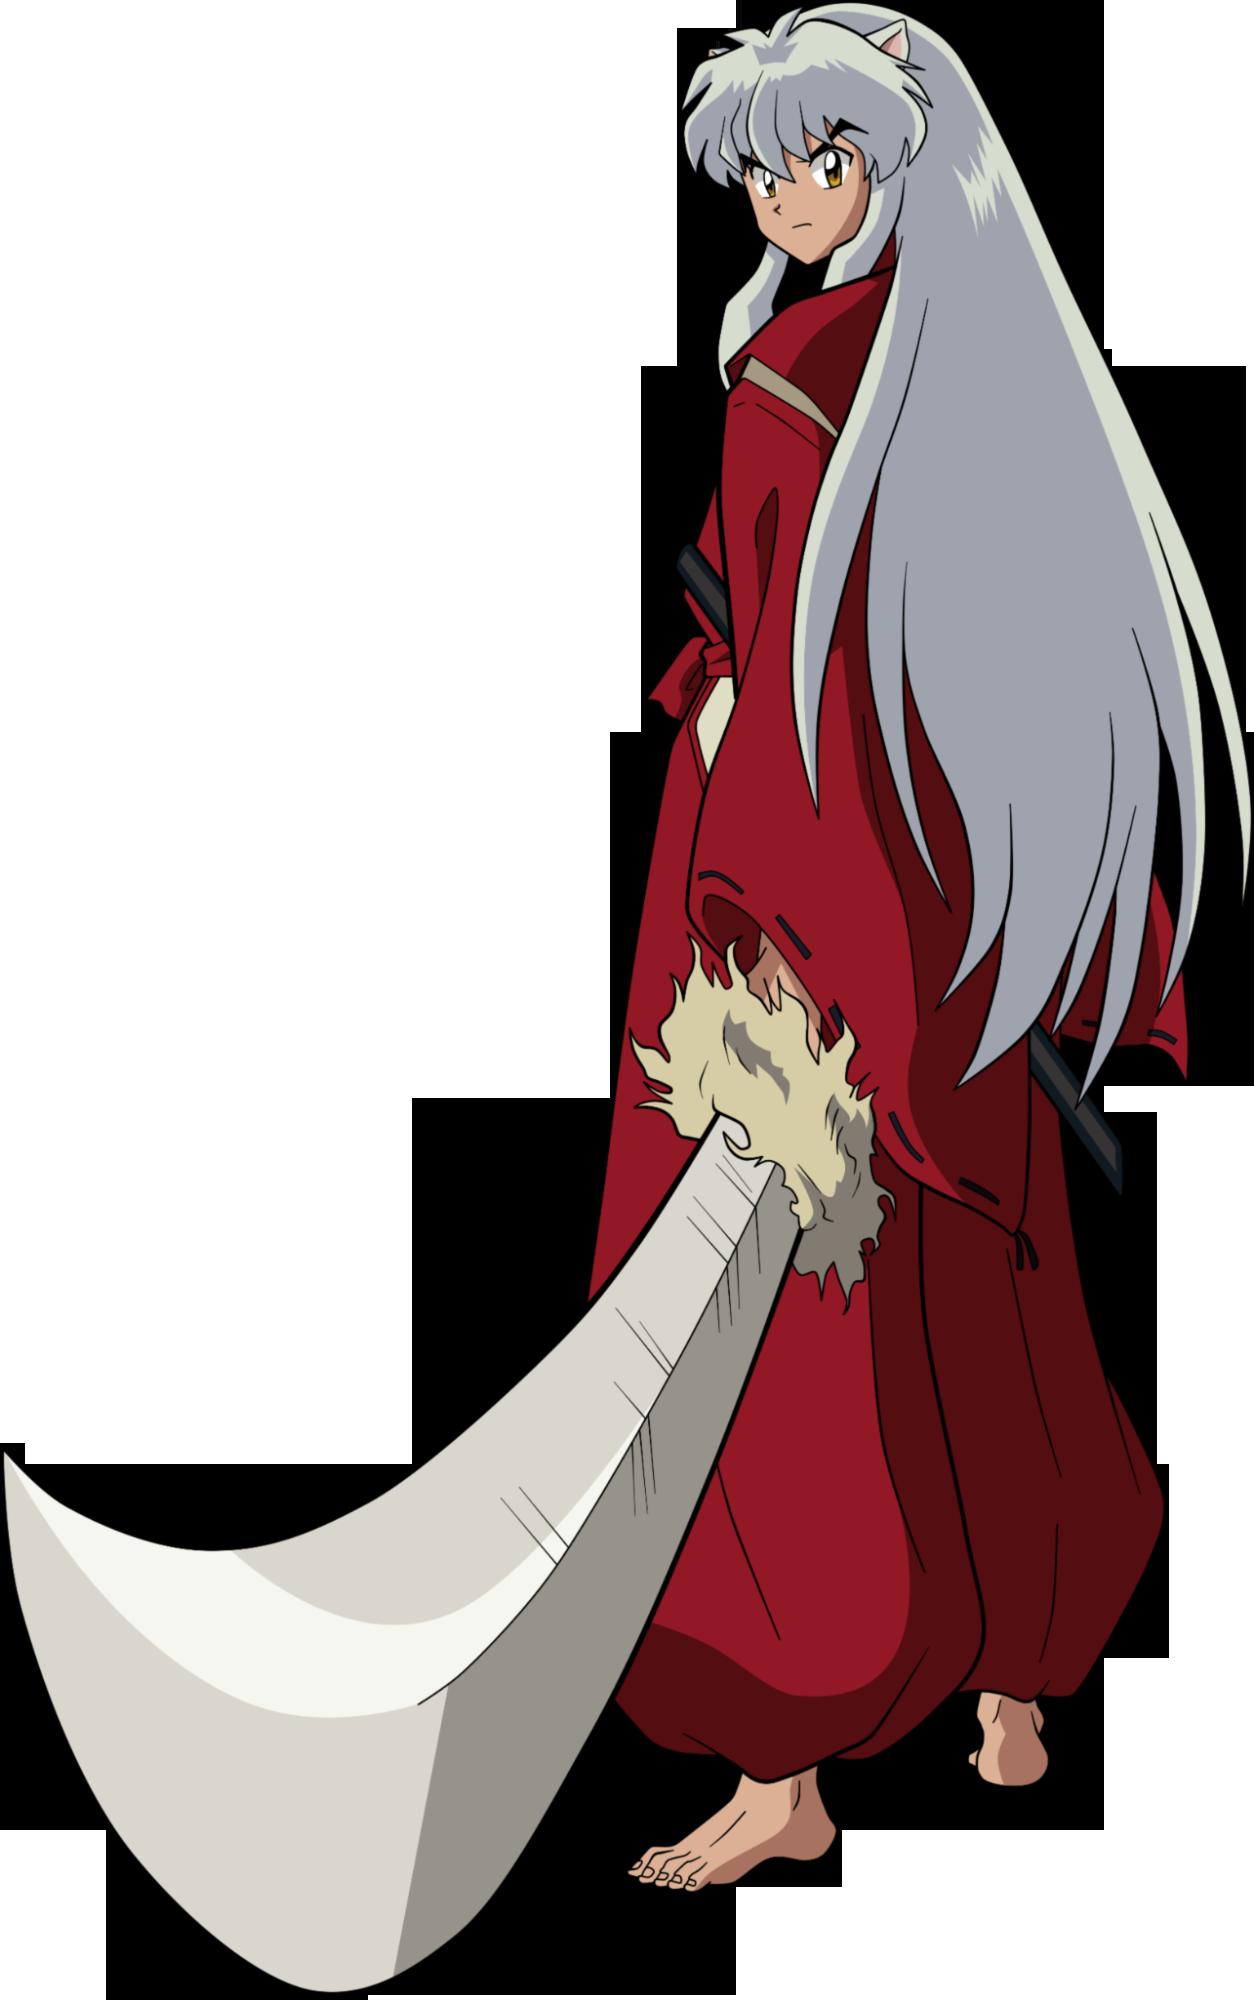 Inuyasha Personaje Inuyasha Wiki Fandom Powered By Wikia